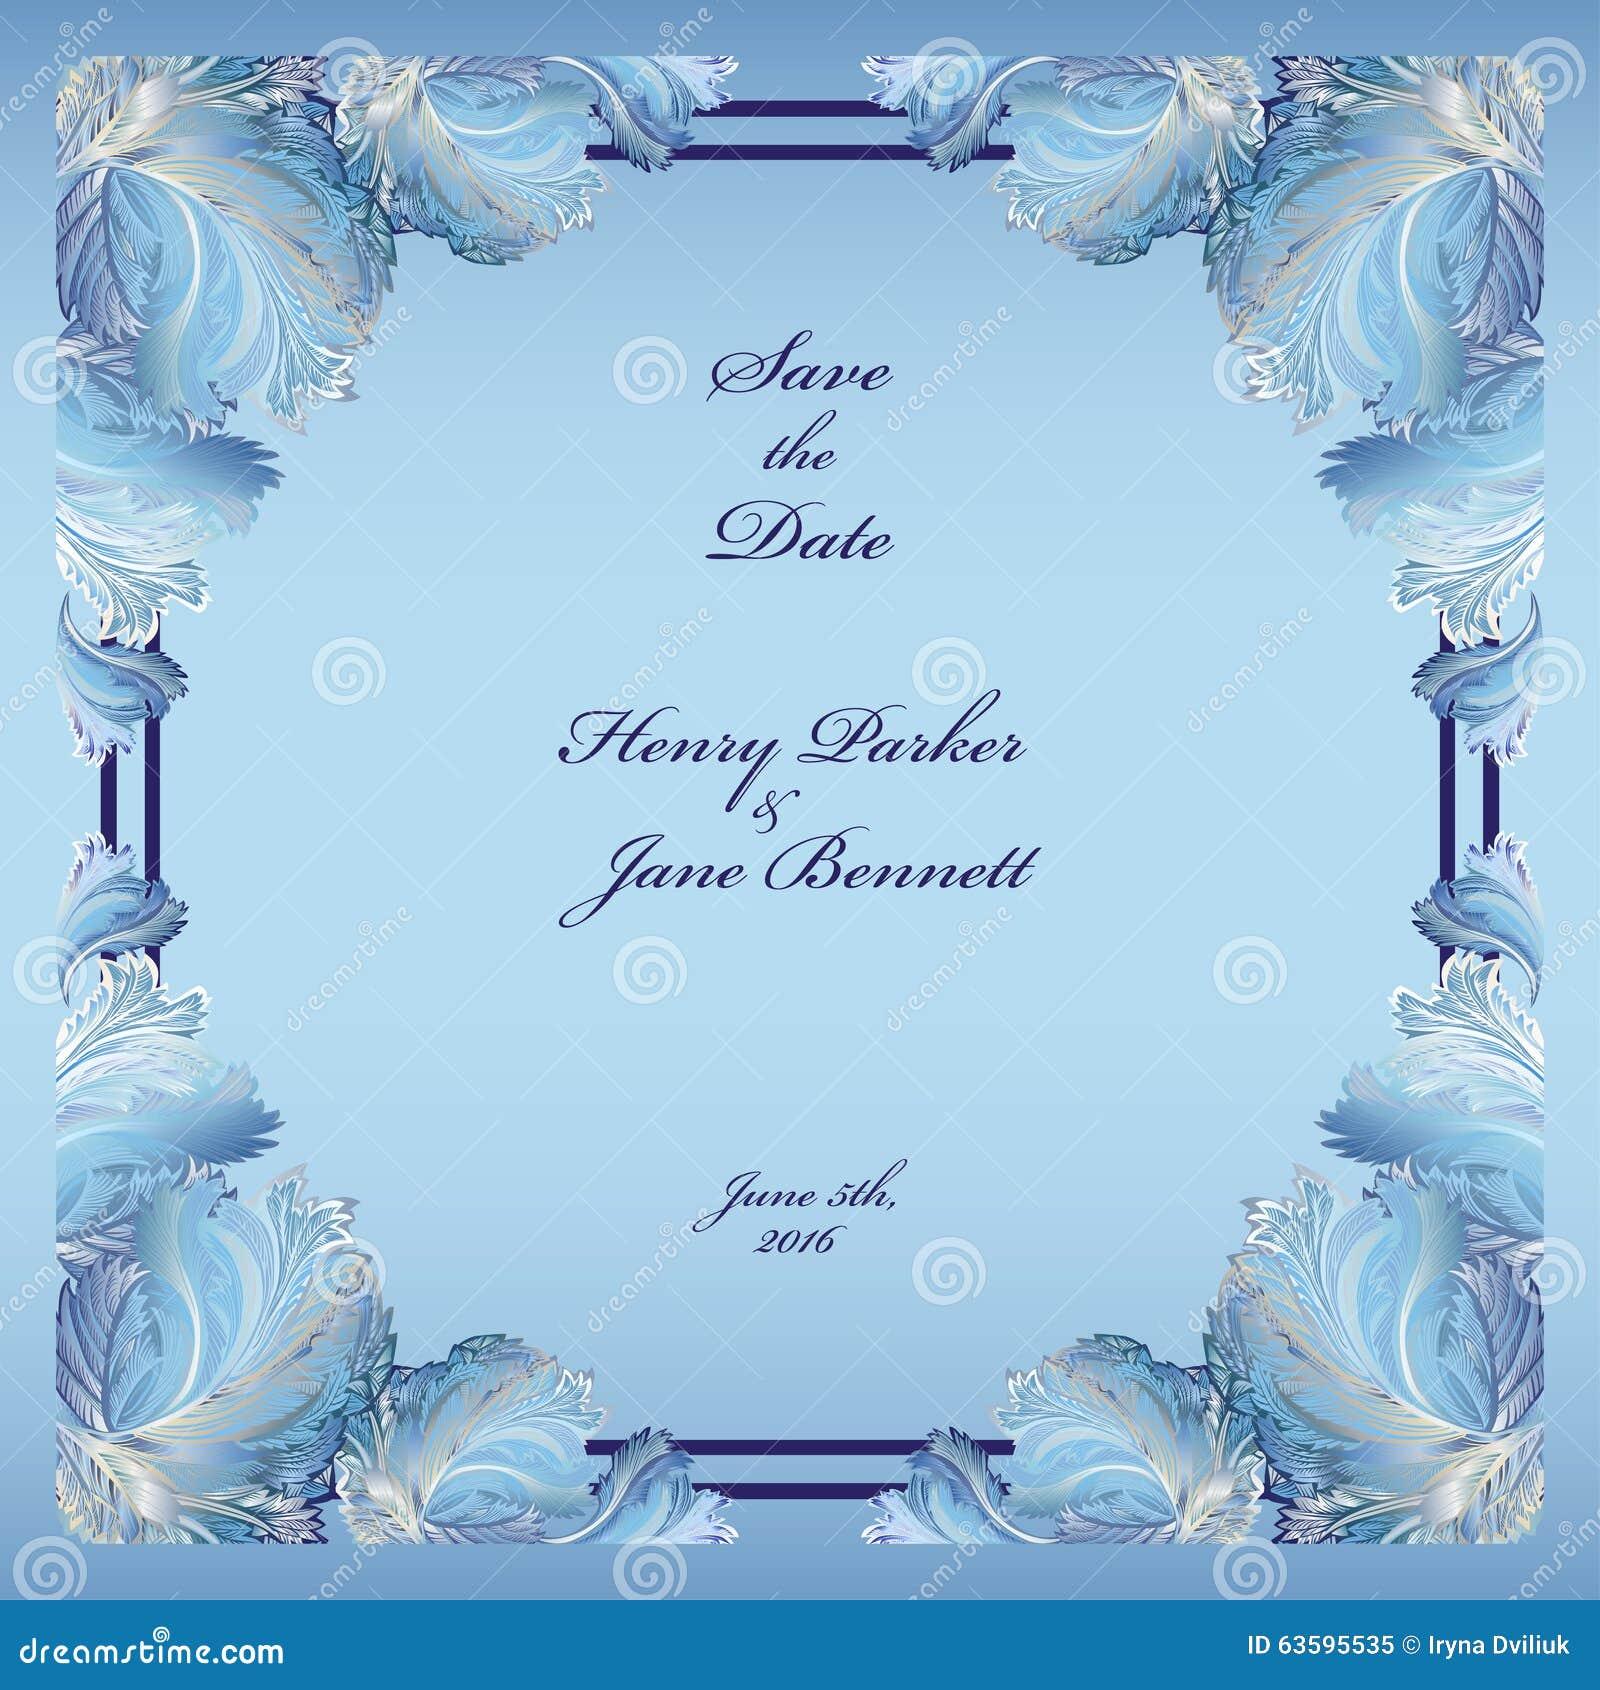 Winter Frozen Glass Design Wedding Frame Background Vector